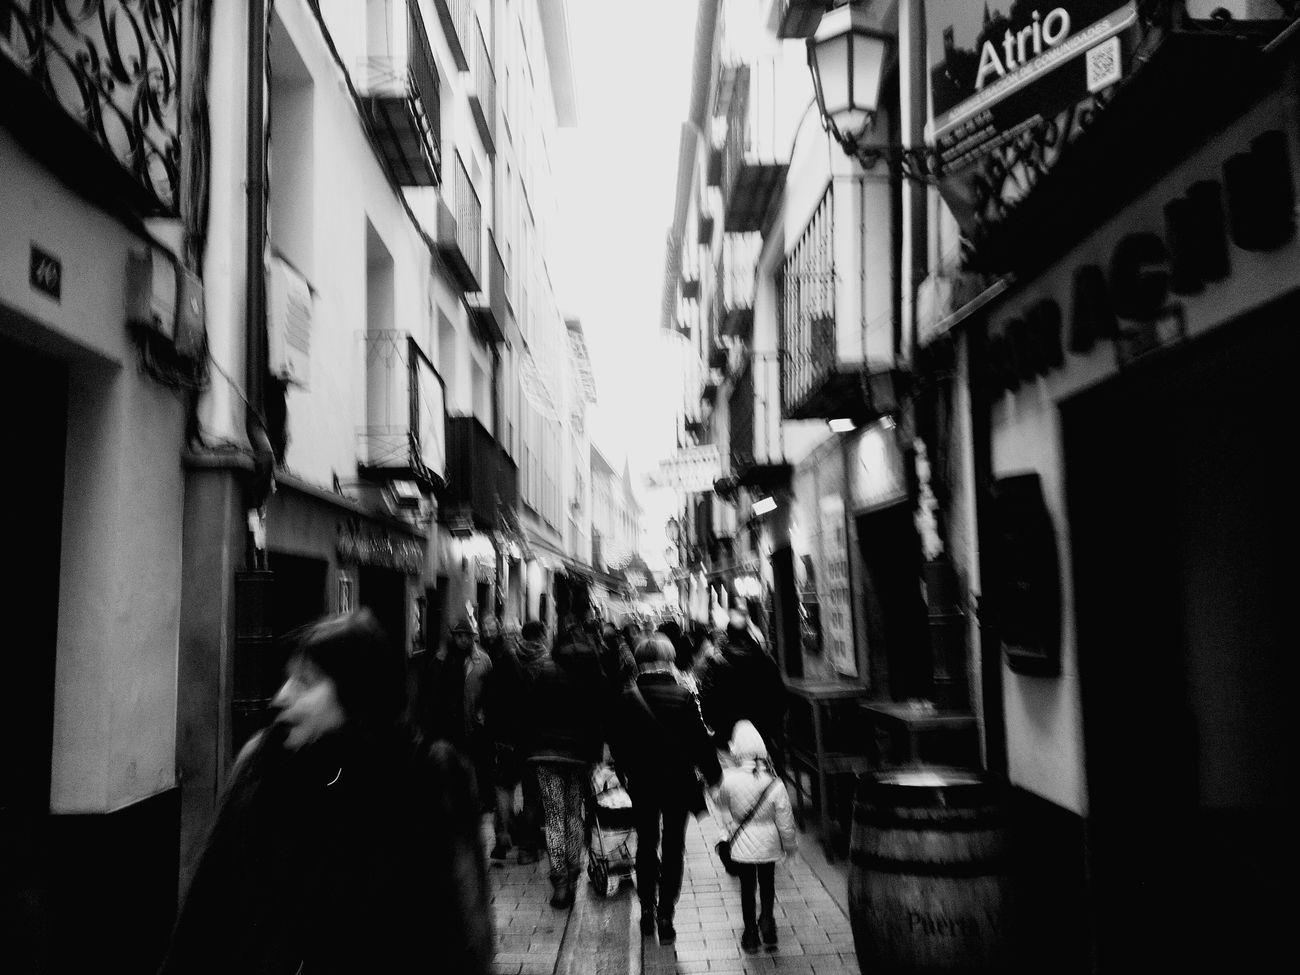 Logroño Street Callelaurel People Blackandwhite Rainy Day